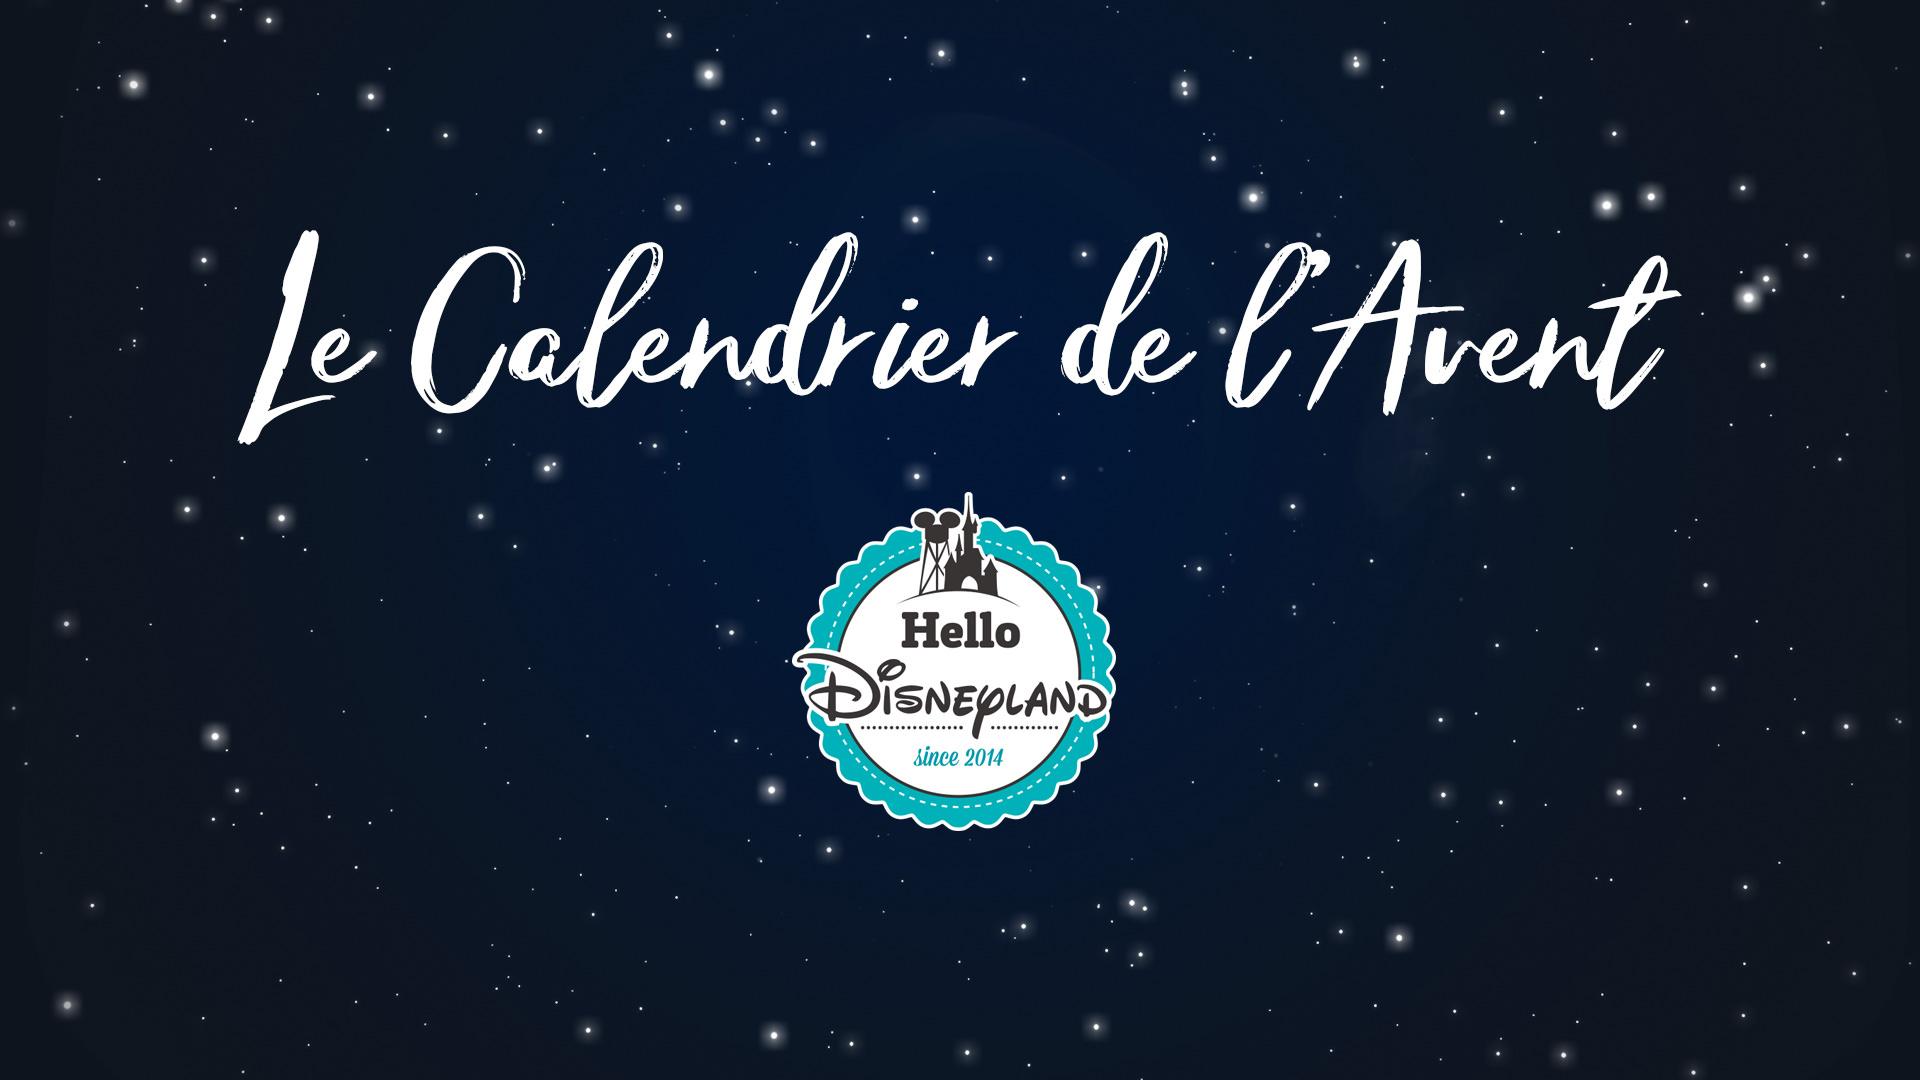 Calendrier De L Avent Minnie.Le Calendrier De L Avent Hello Disneyland 24 Cadeaux